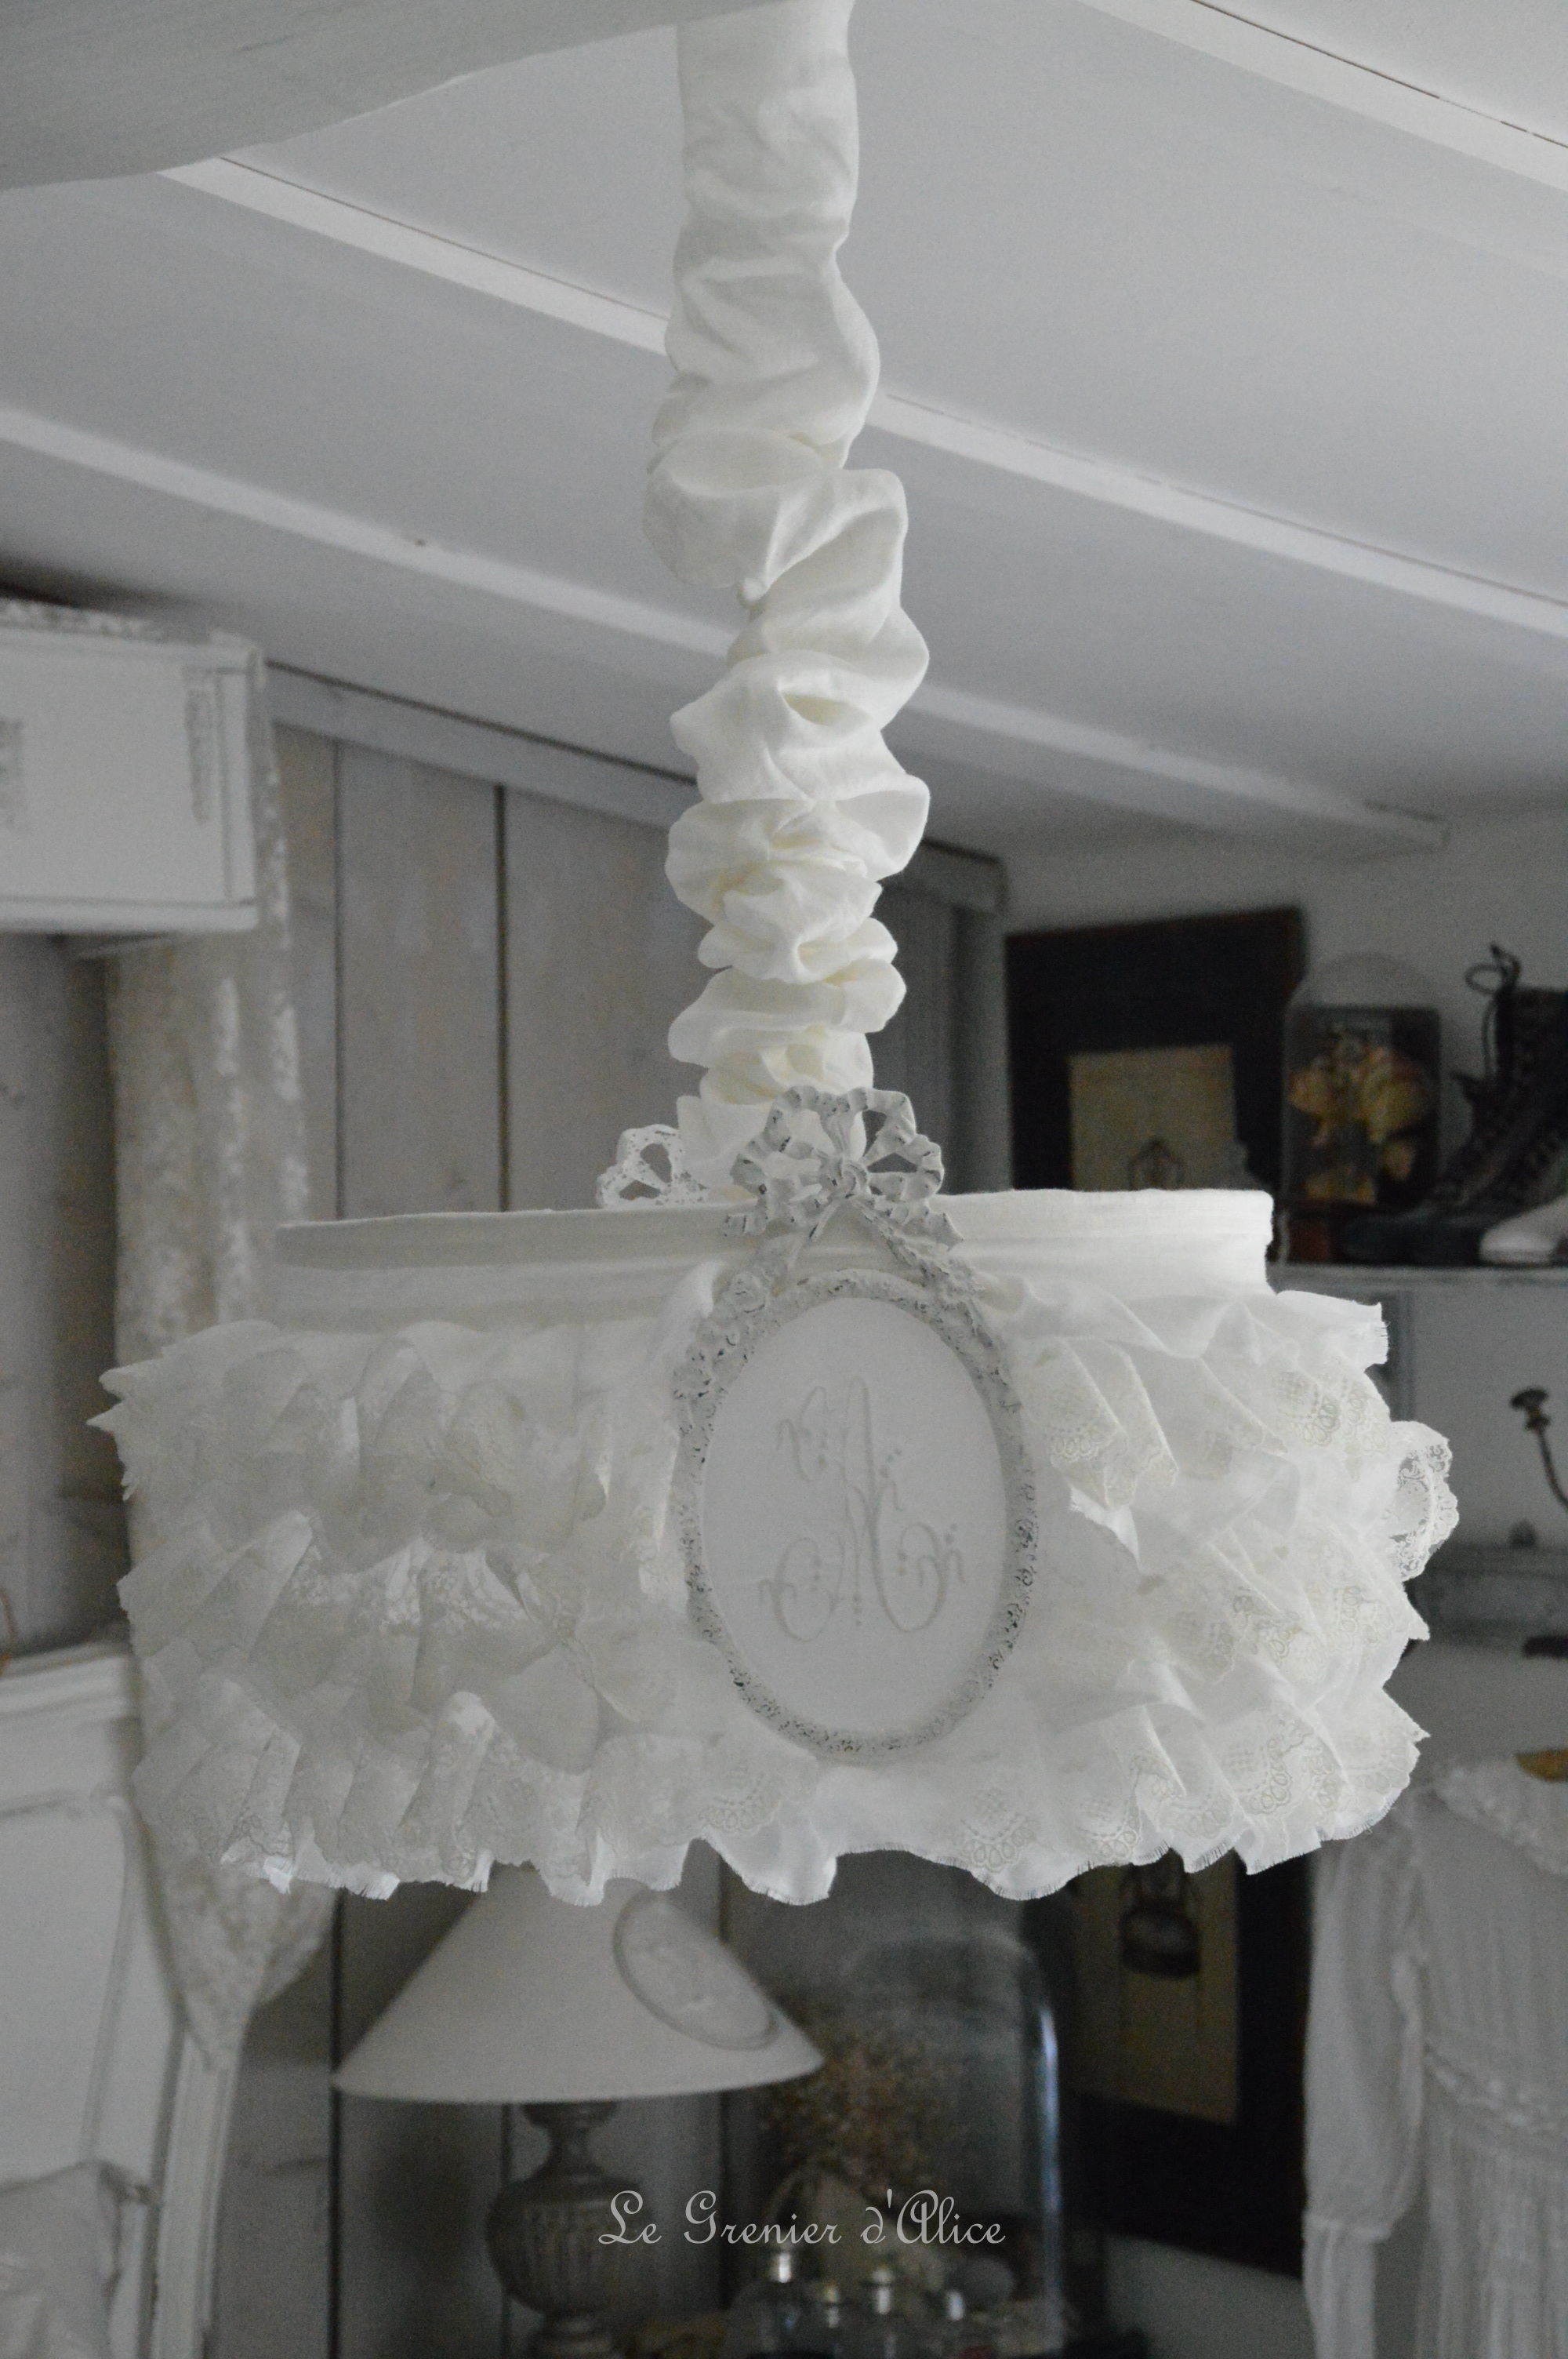 lustre abat jour froufrou shabby le grenier d 39 alice. Black Bedroom Furniture Sets. Home Design Ideas